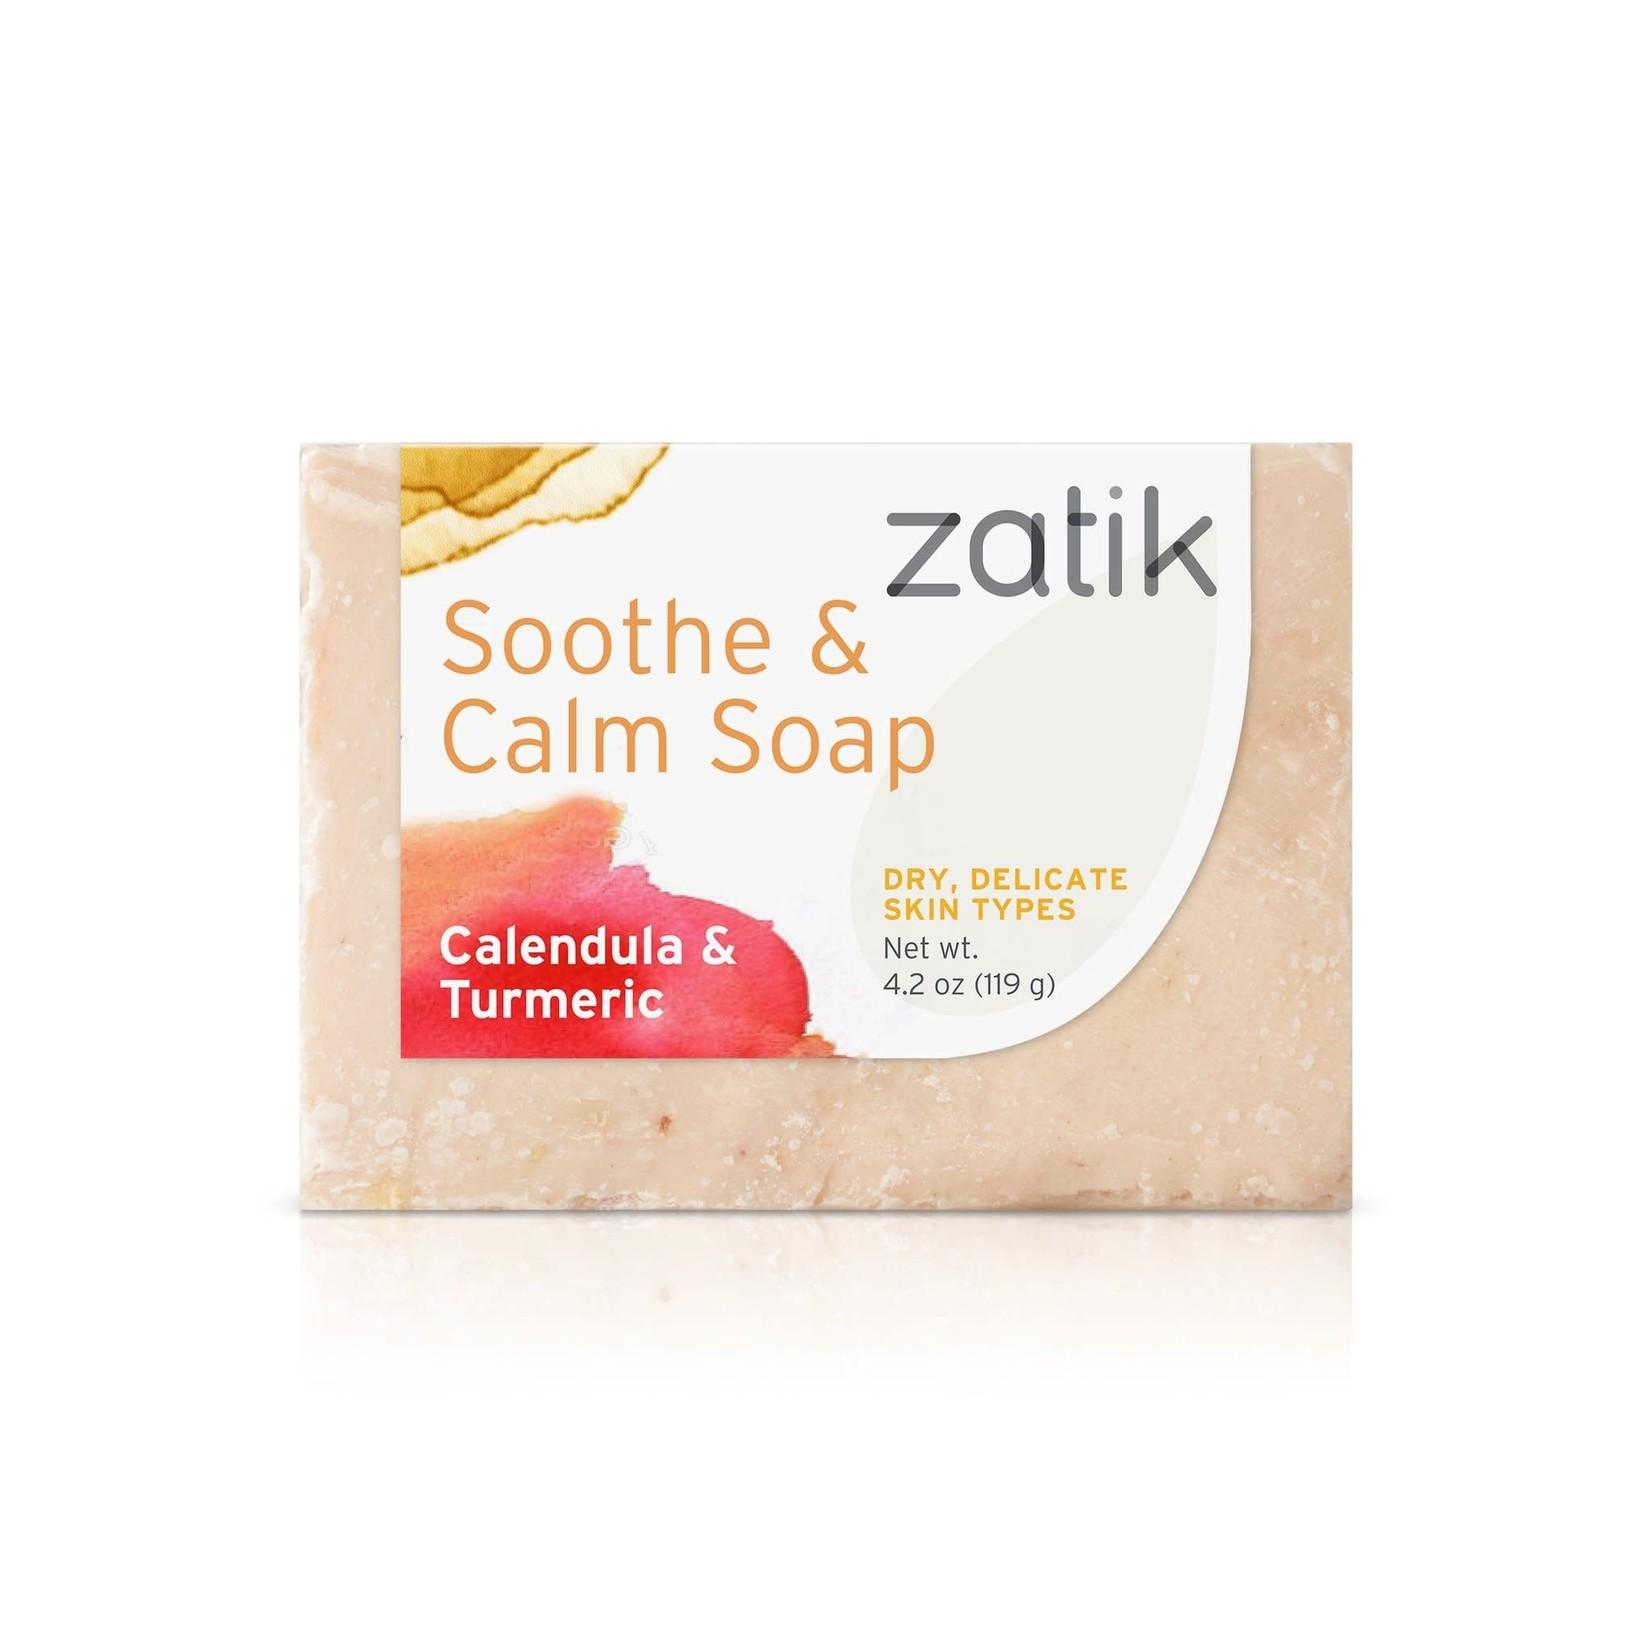 Zatik Inc. Zatik Soothe & Calm Soap Calendula & Turmeric 4.2oz